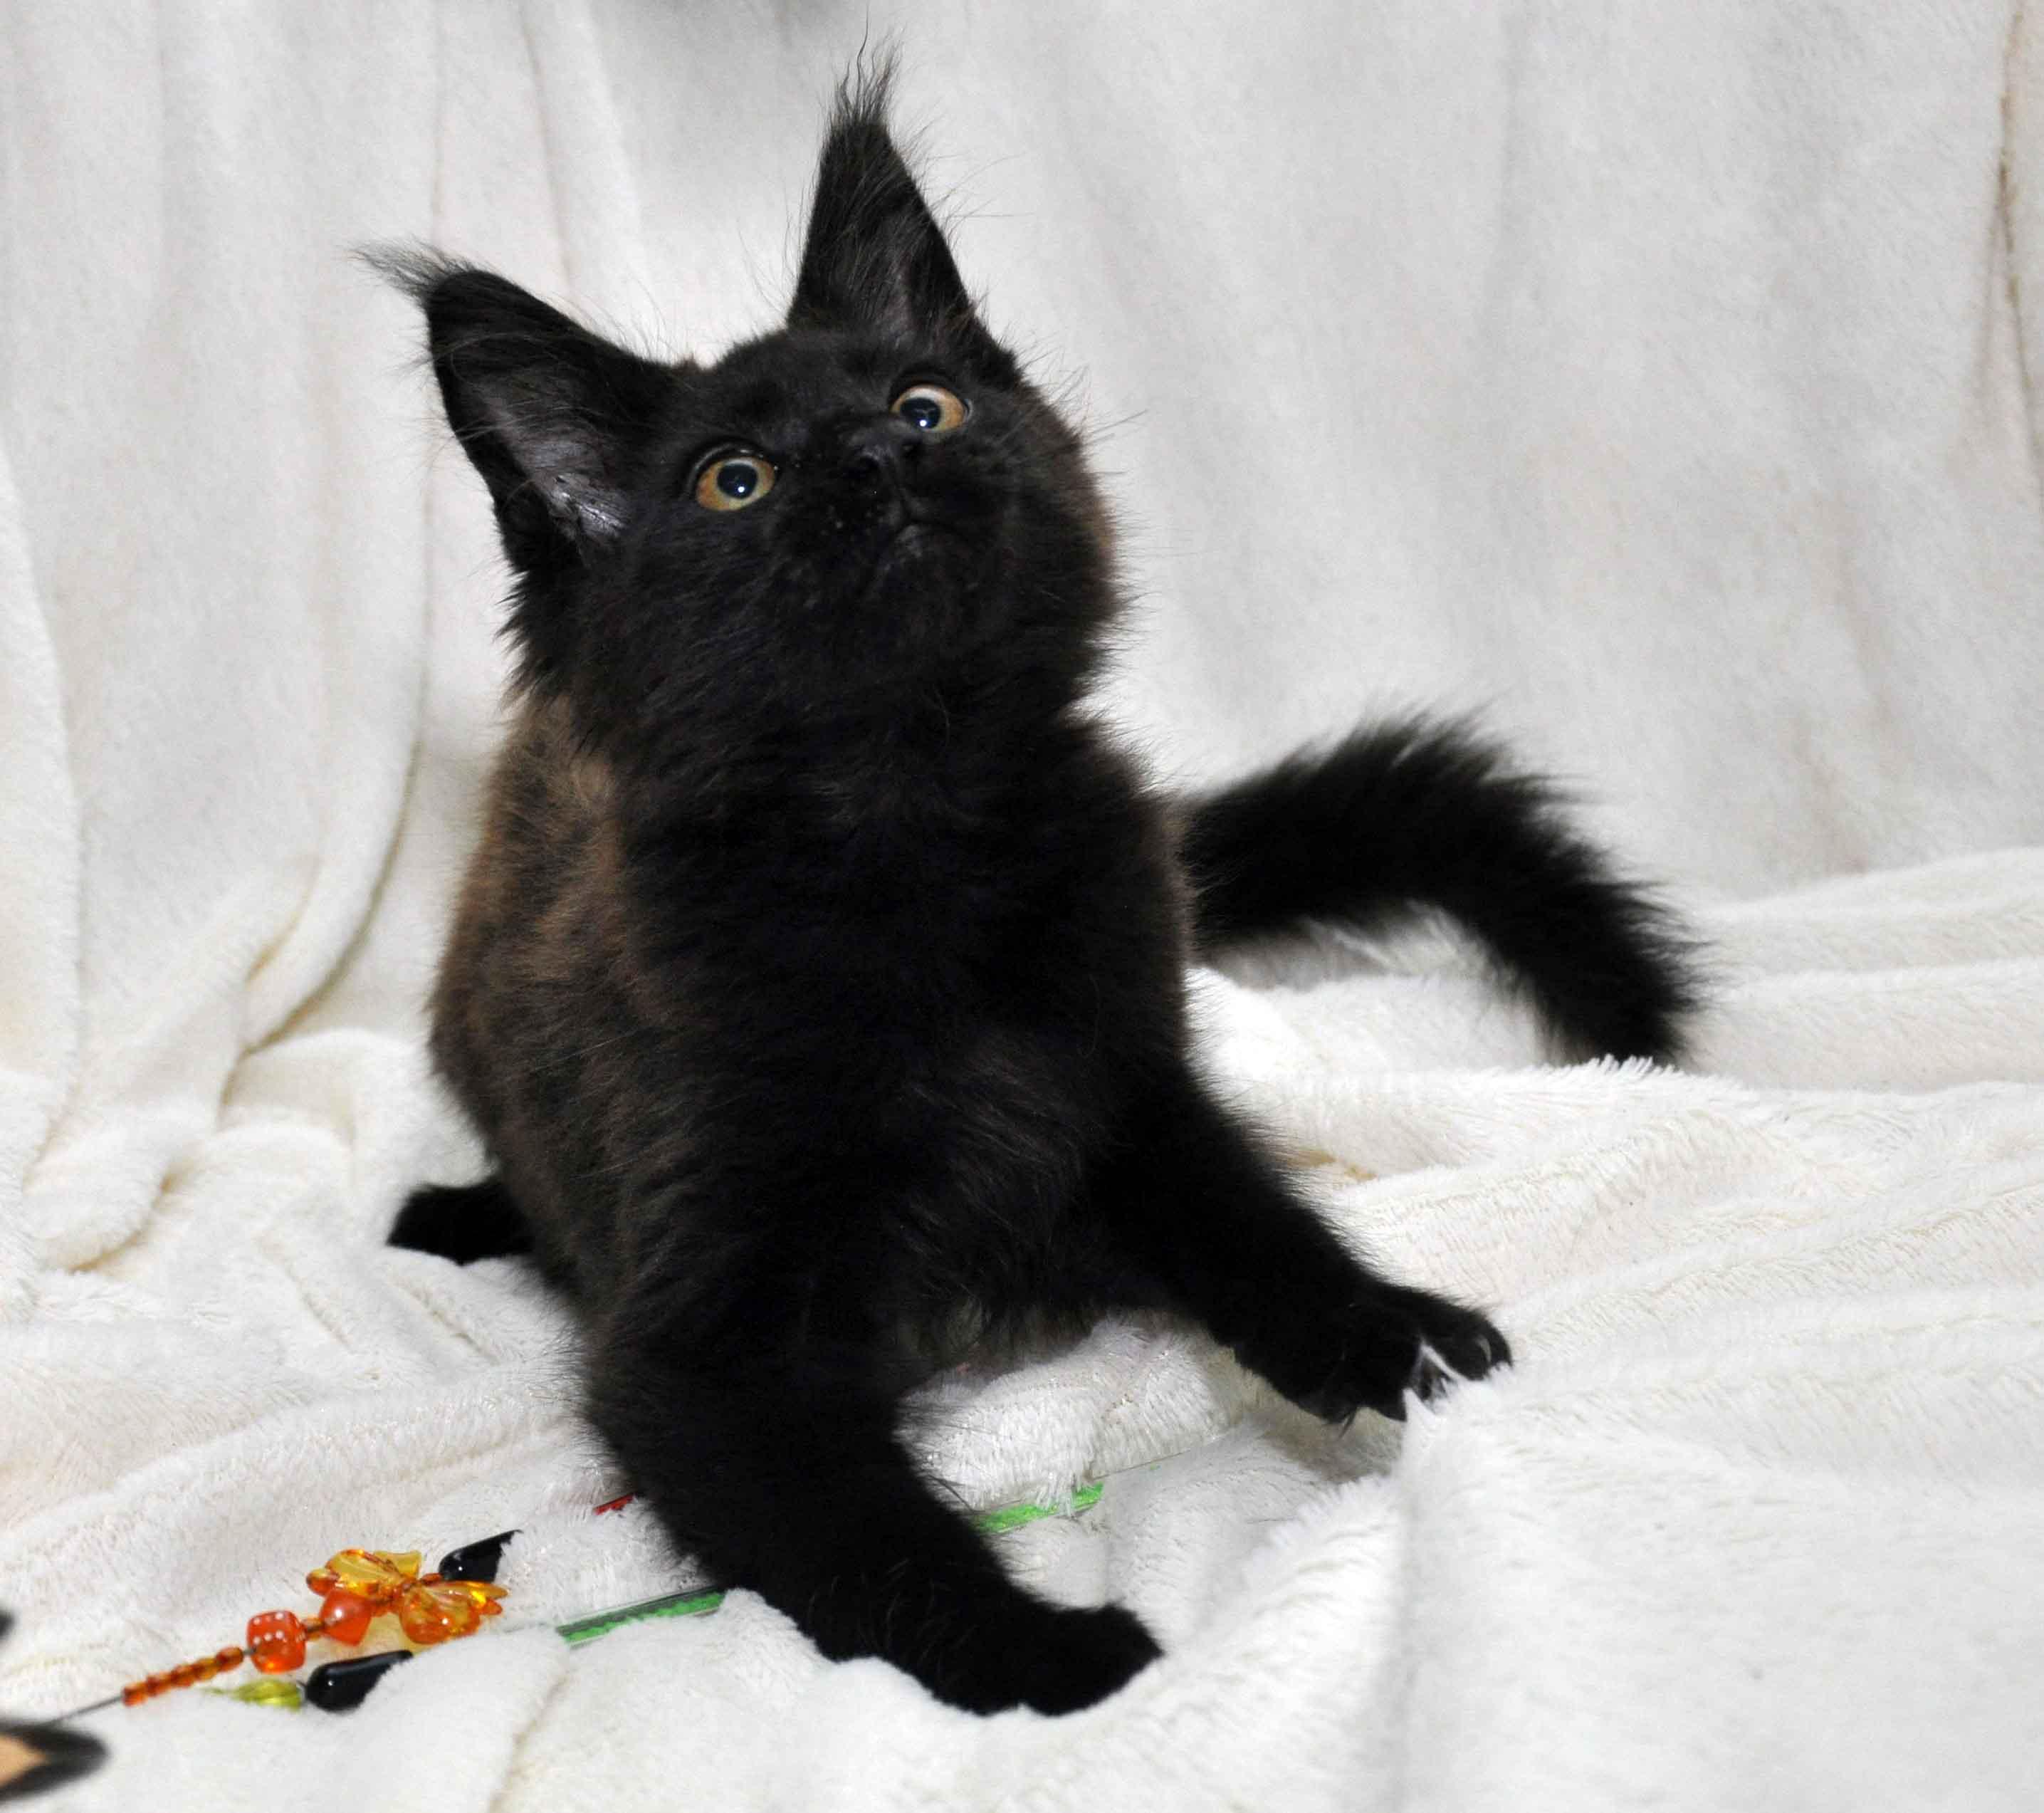 Кот мейн кун JULIOPOLIS возраст 3.5 месяца фото4